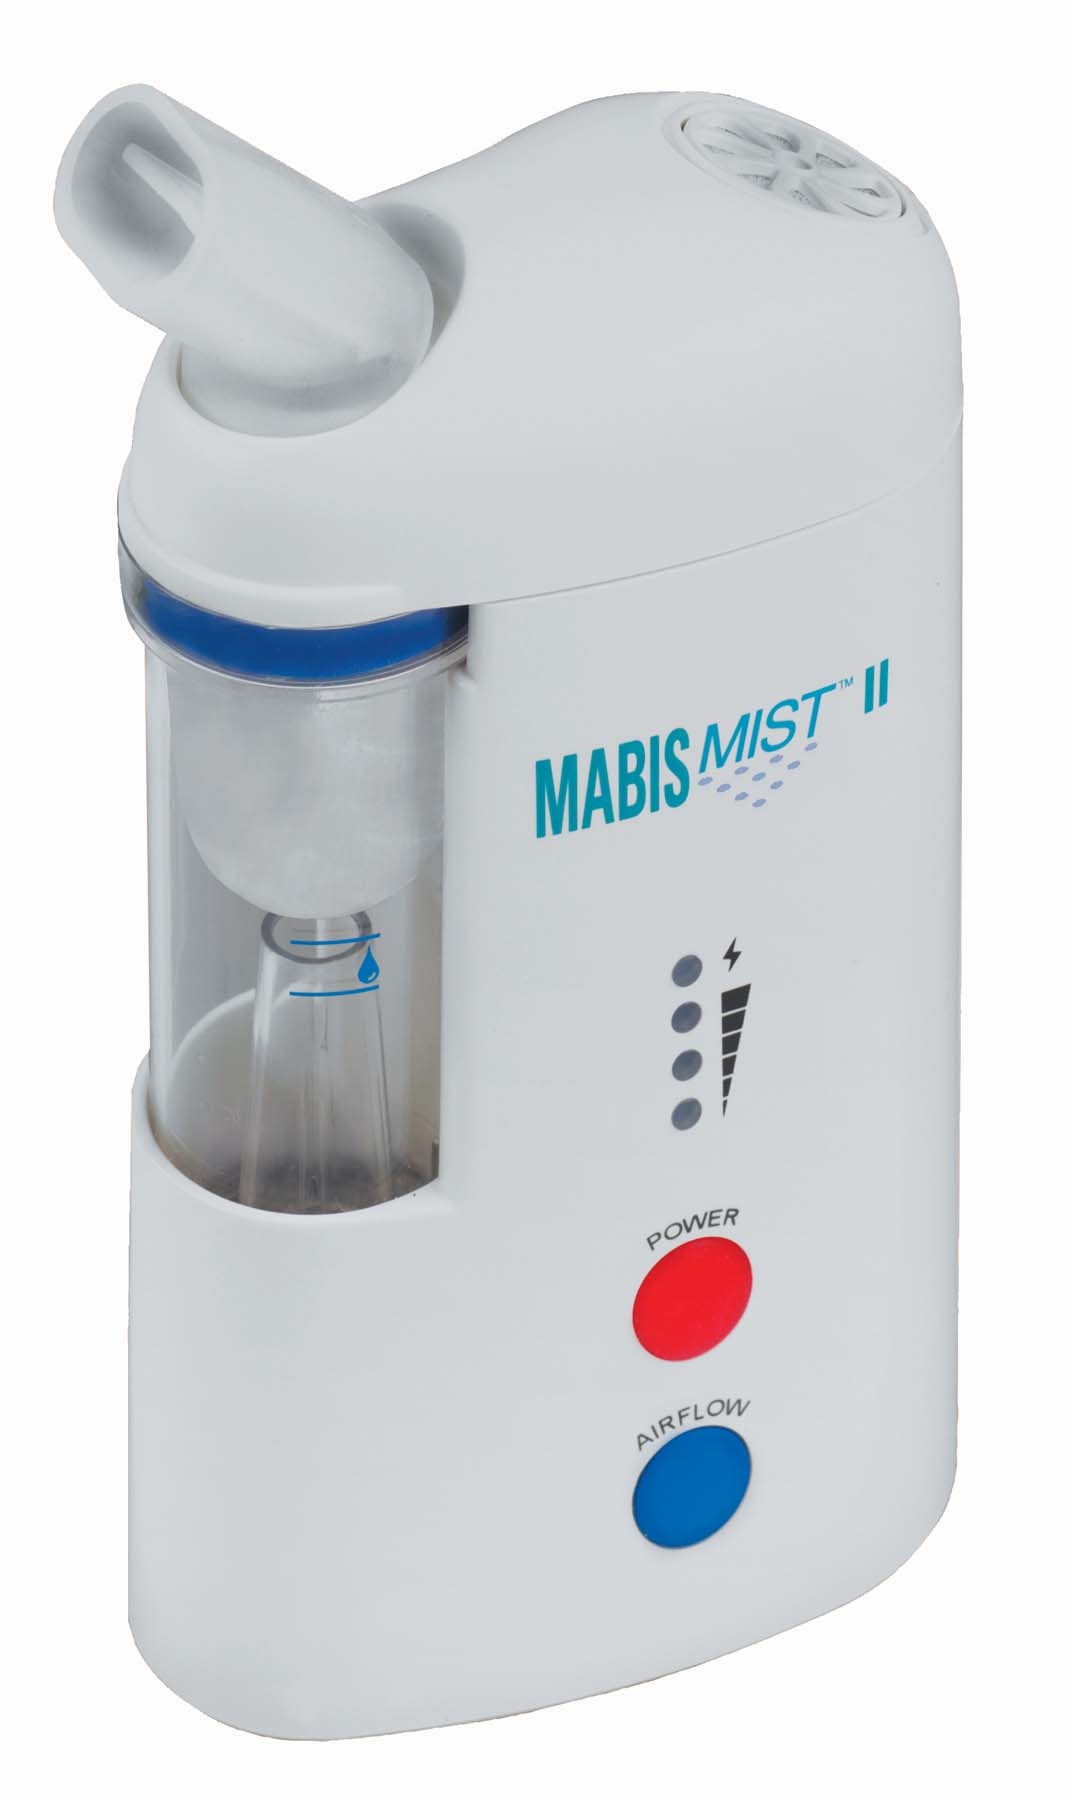 air-filters-for-mabismist-ii-ultrasonic-nebulizer-10-per-pack-40-278-000-lr.jpg